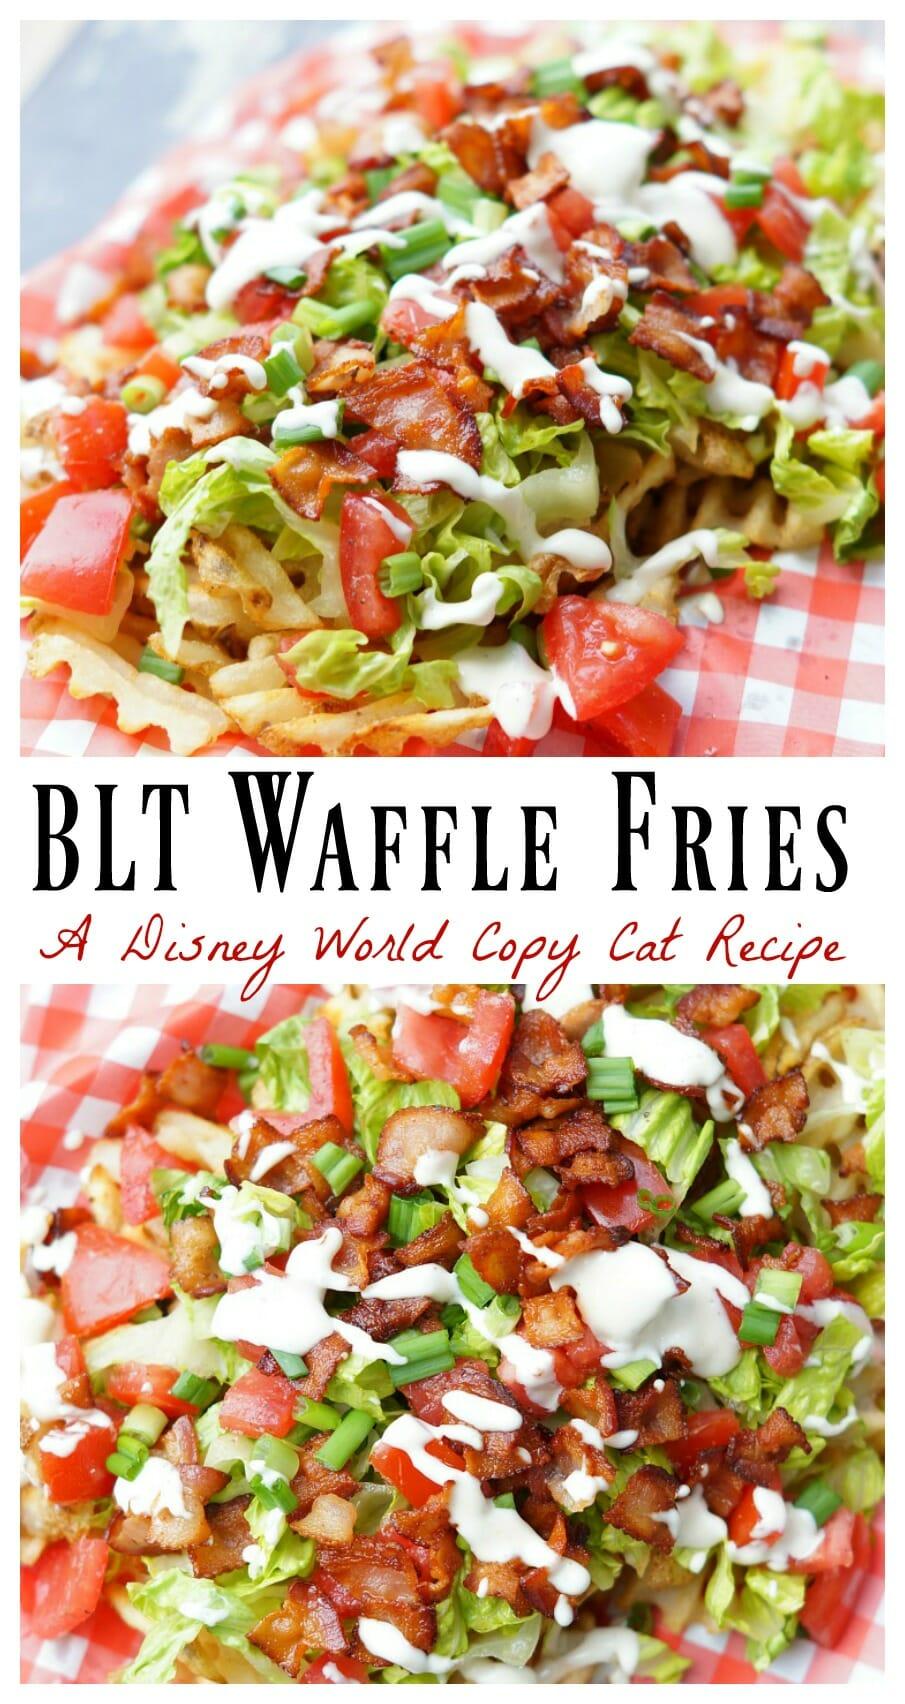 Just like Disney's World's BLT Waffle Fries